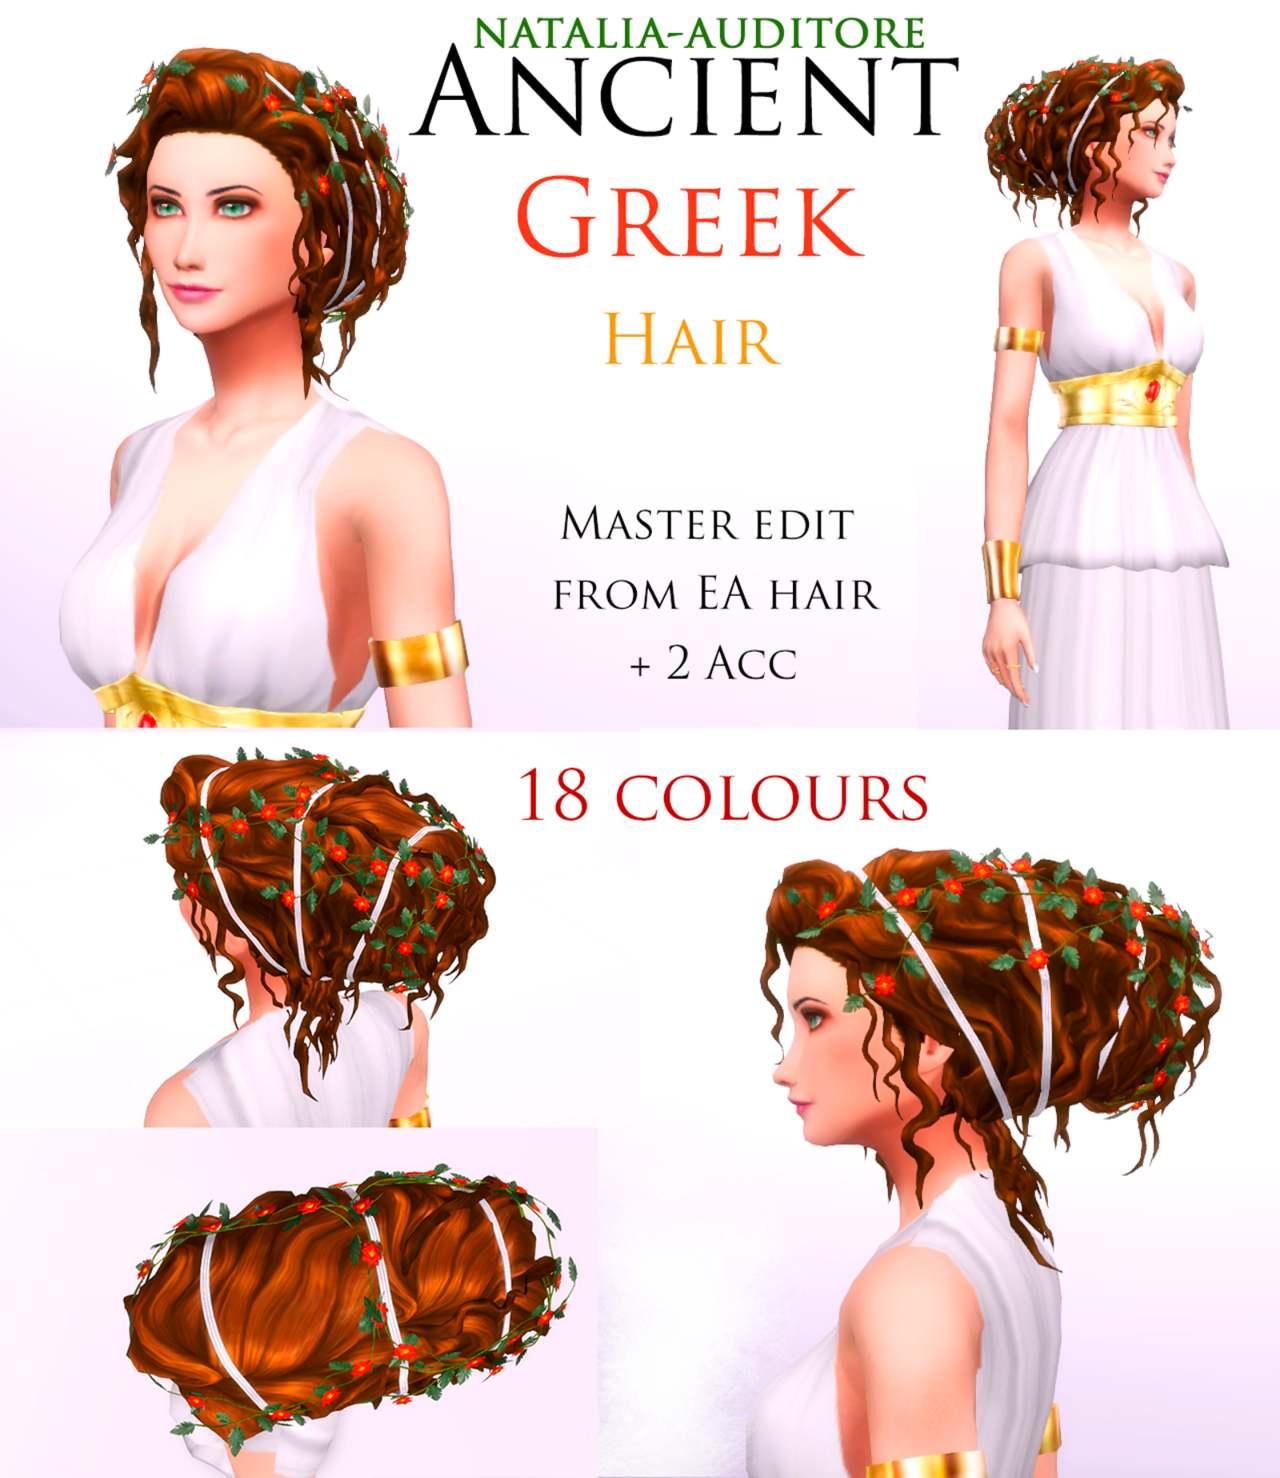 Прическа - Ancient greek hair